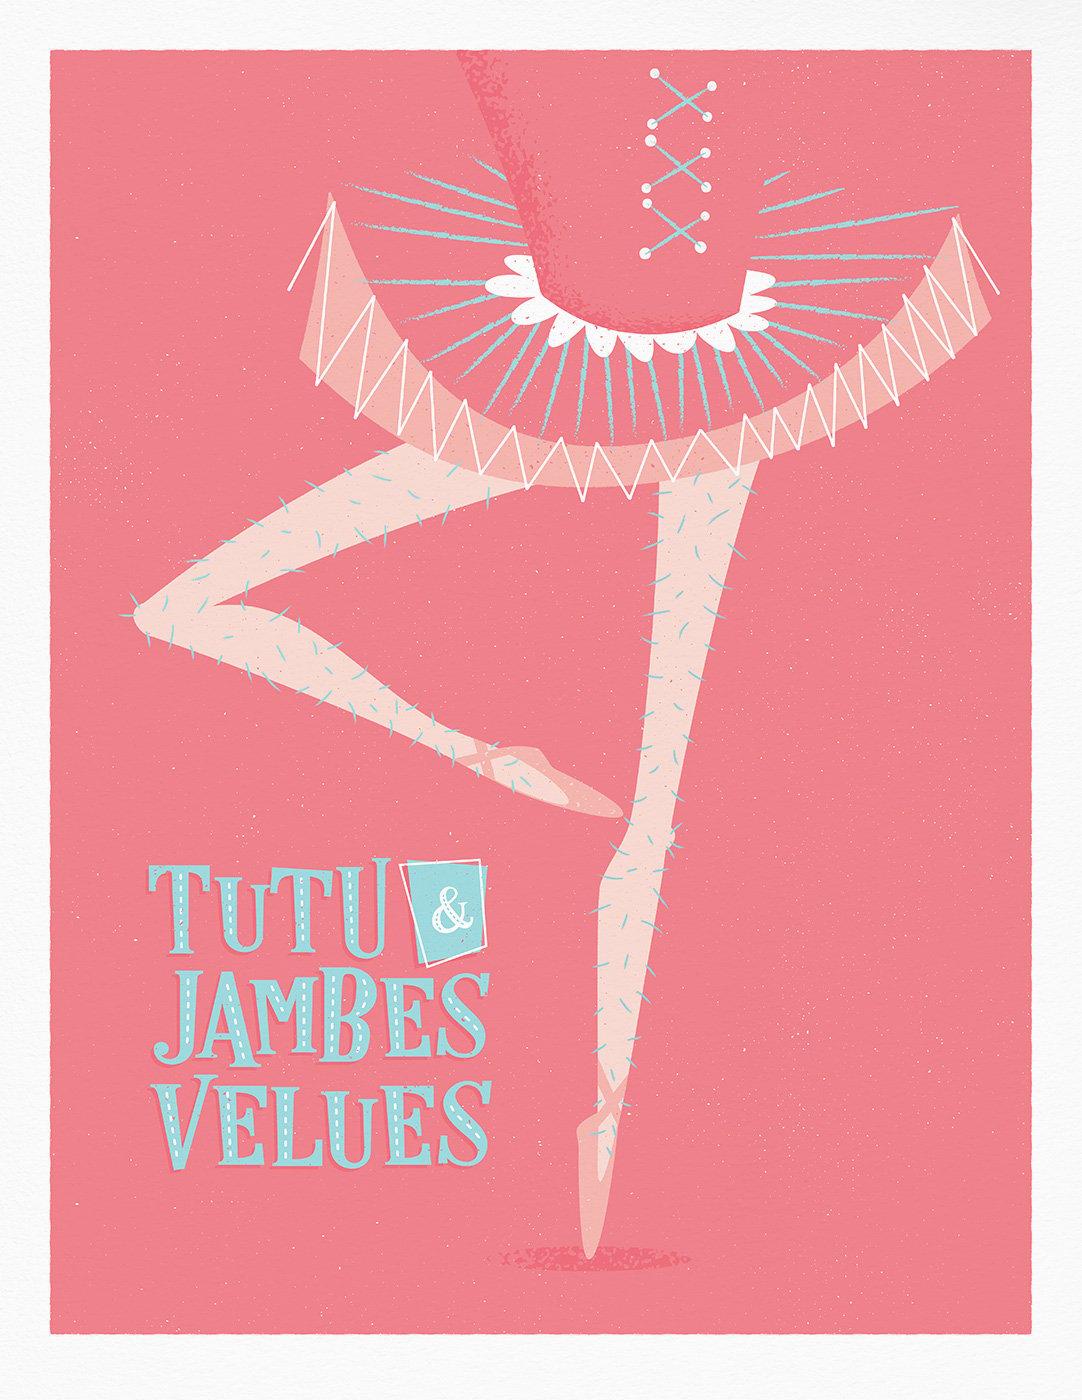 Image of Tutu & Jambes Velue